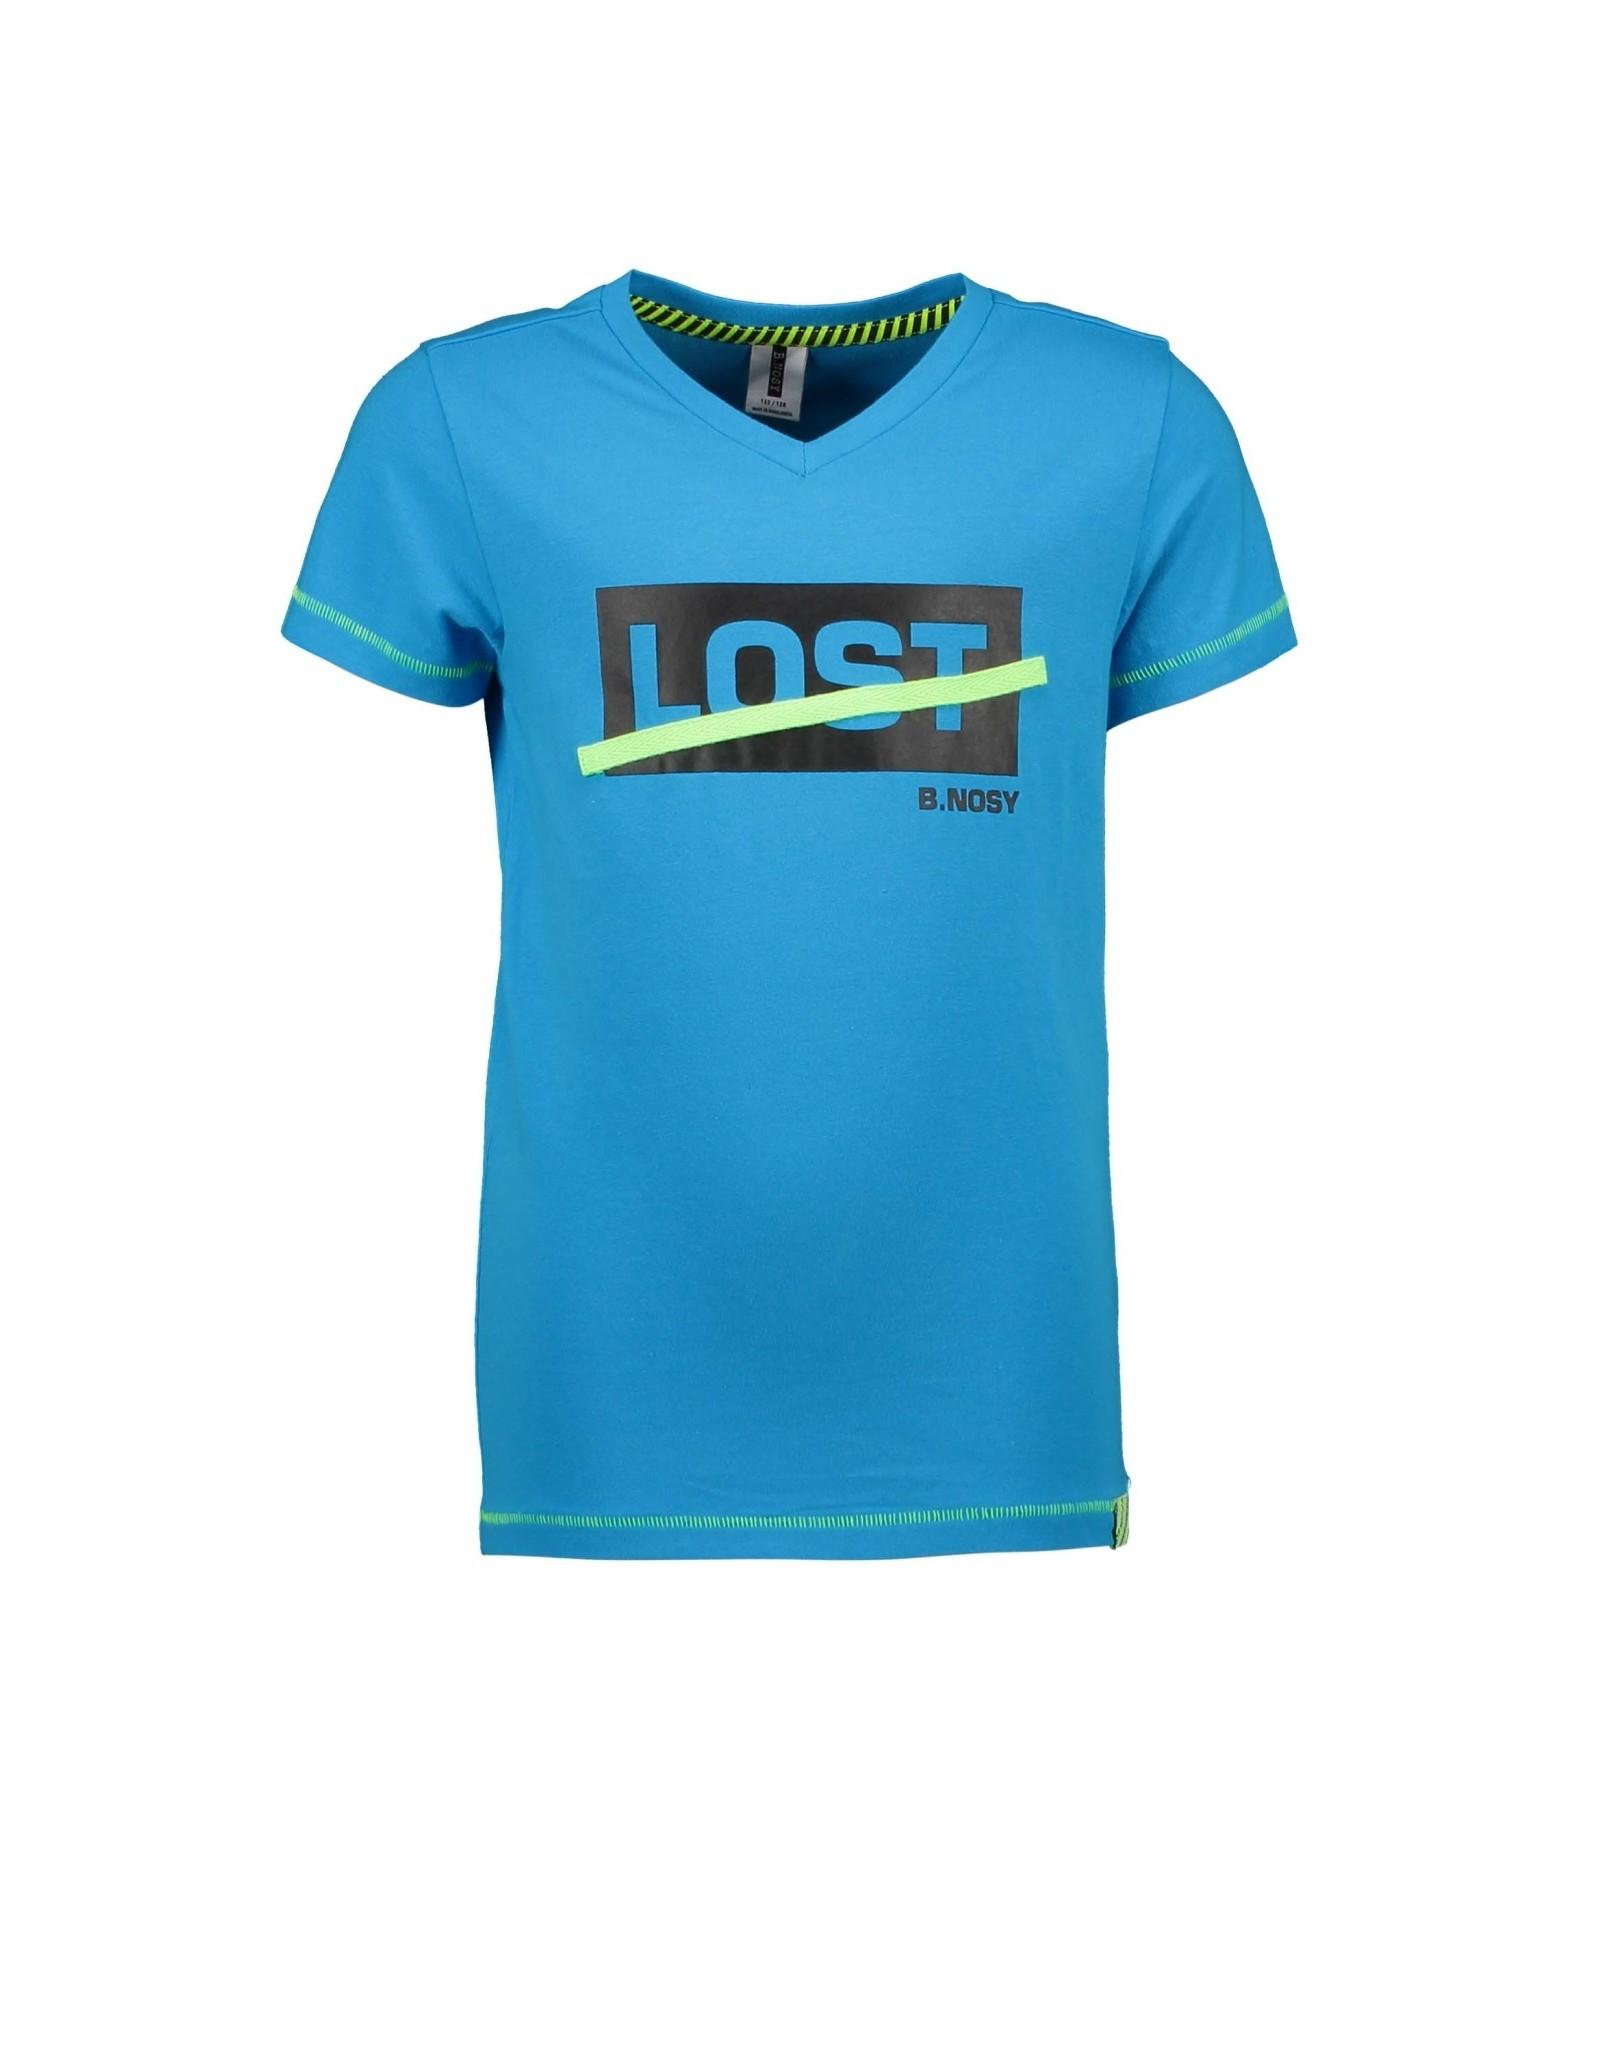 B.Nosy B.Nosy jongens t-shirt Lost Surf Blue